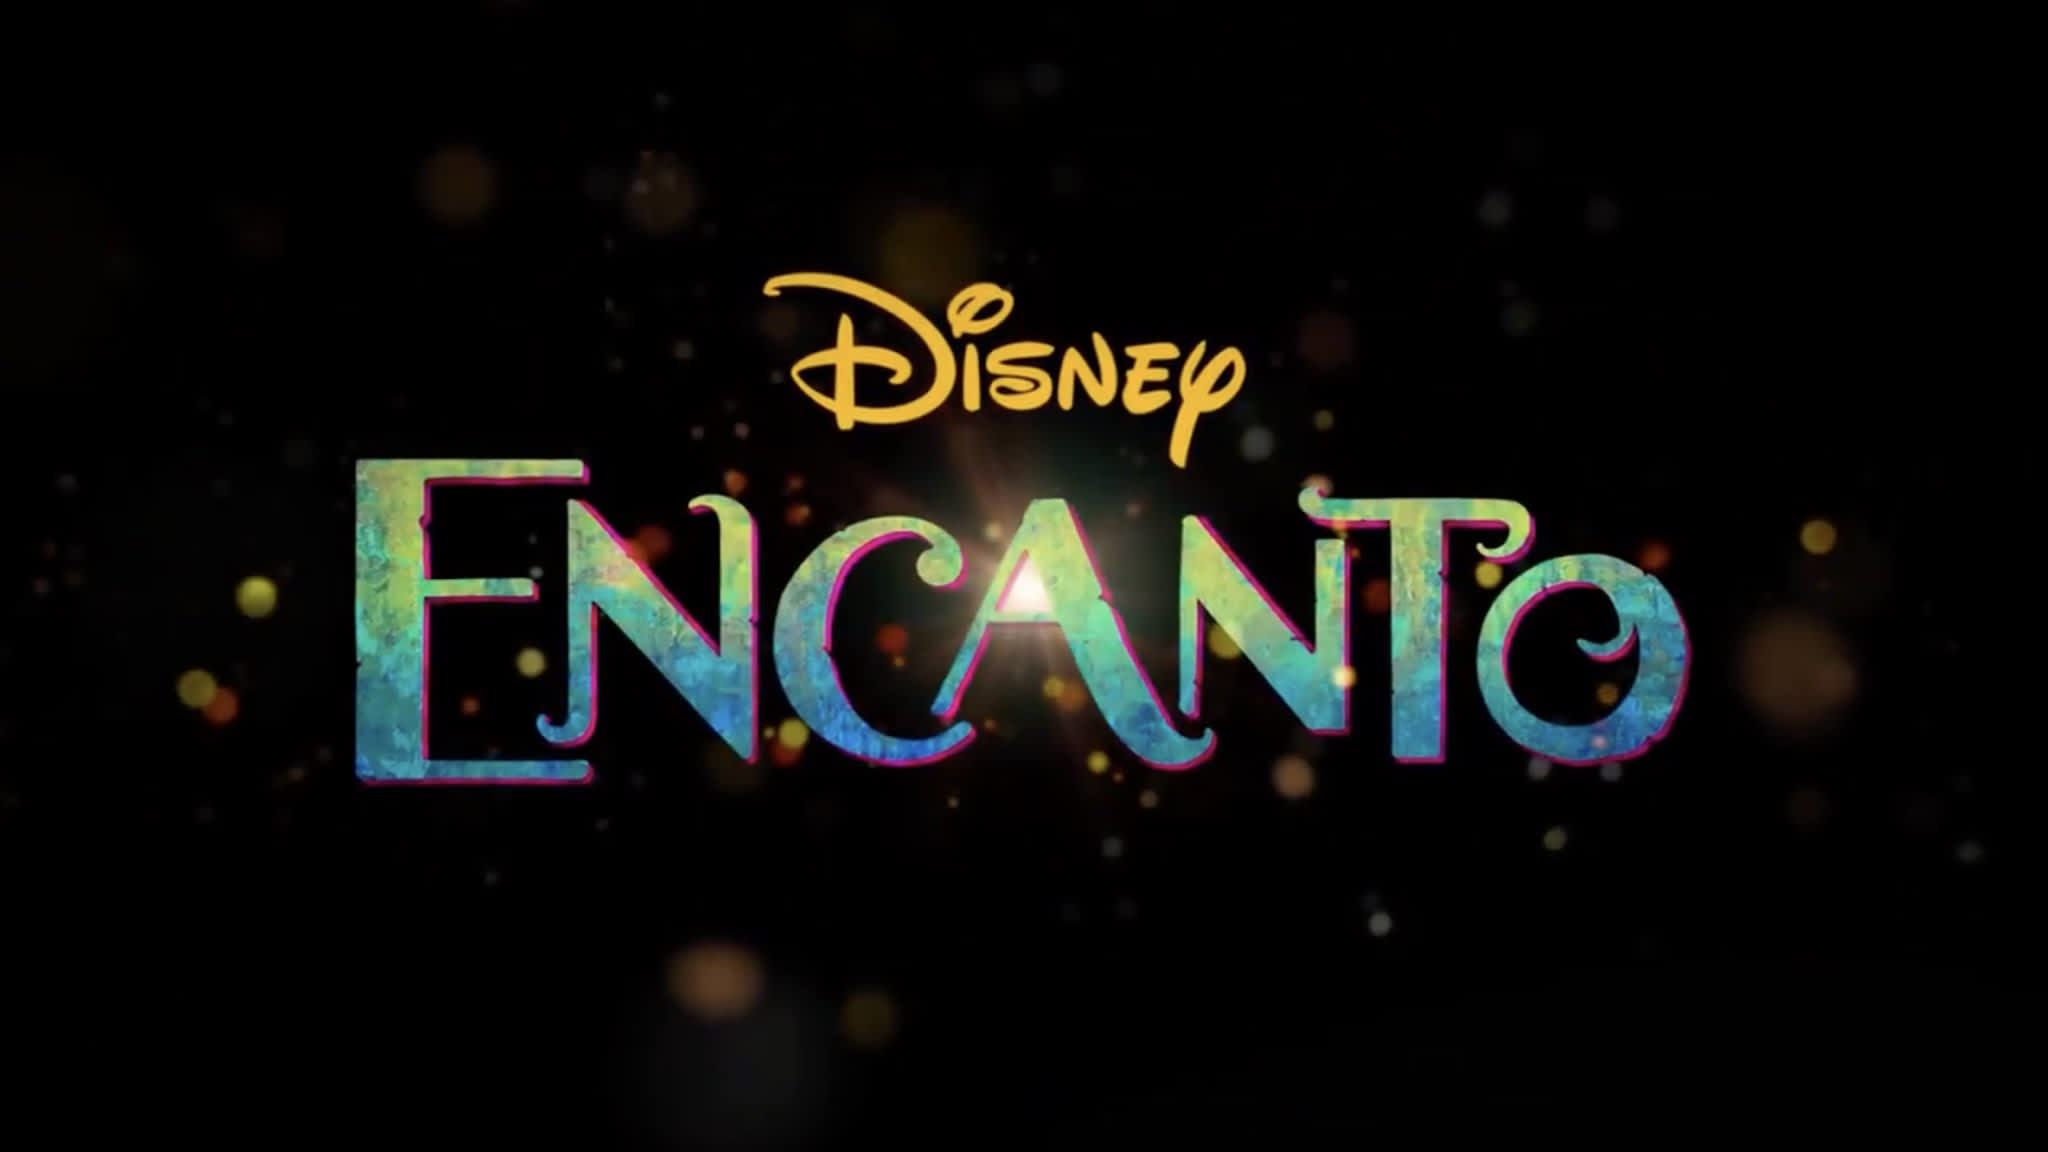 """Colombia Tierra Querida"" featured in new Disney film trailer for Encanto"